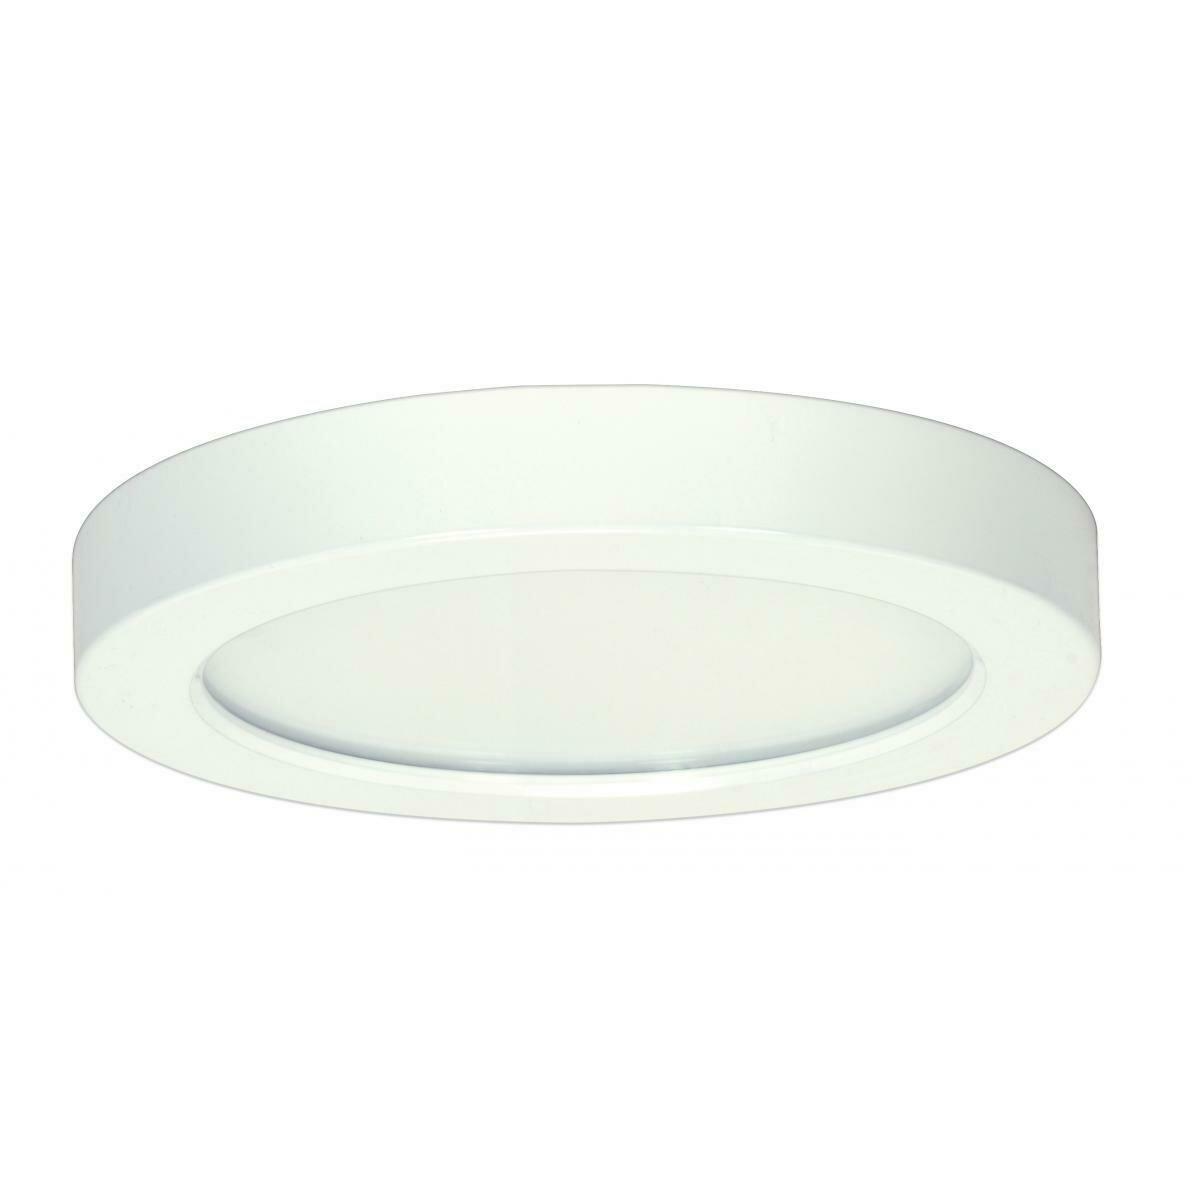 White Round LED Flushmount Fixture